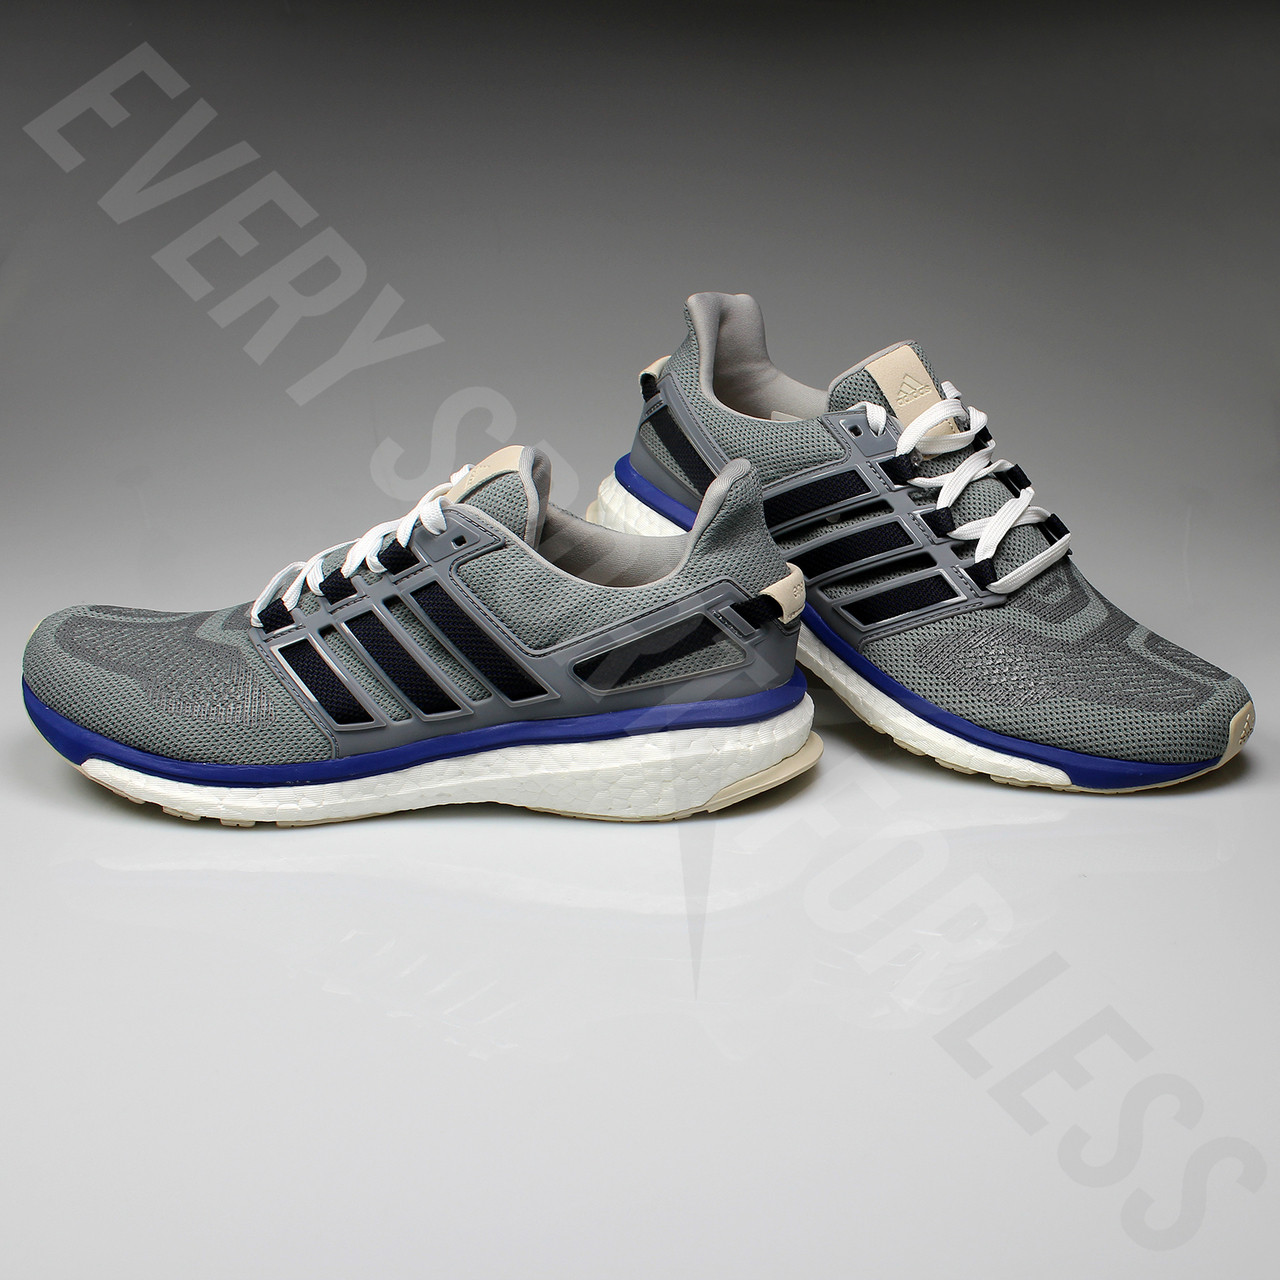 Adidas Energy Boost 3 Men's Running Shoes AQ5958